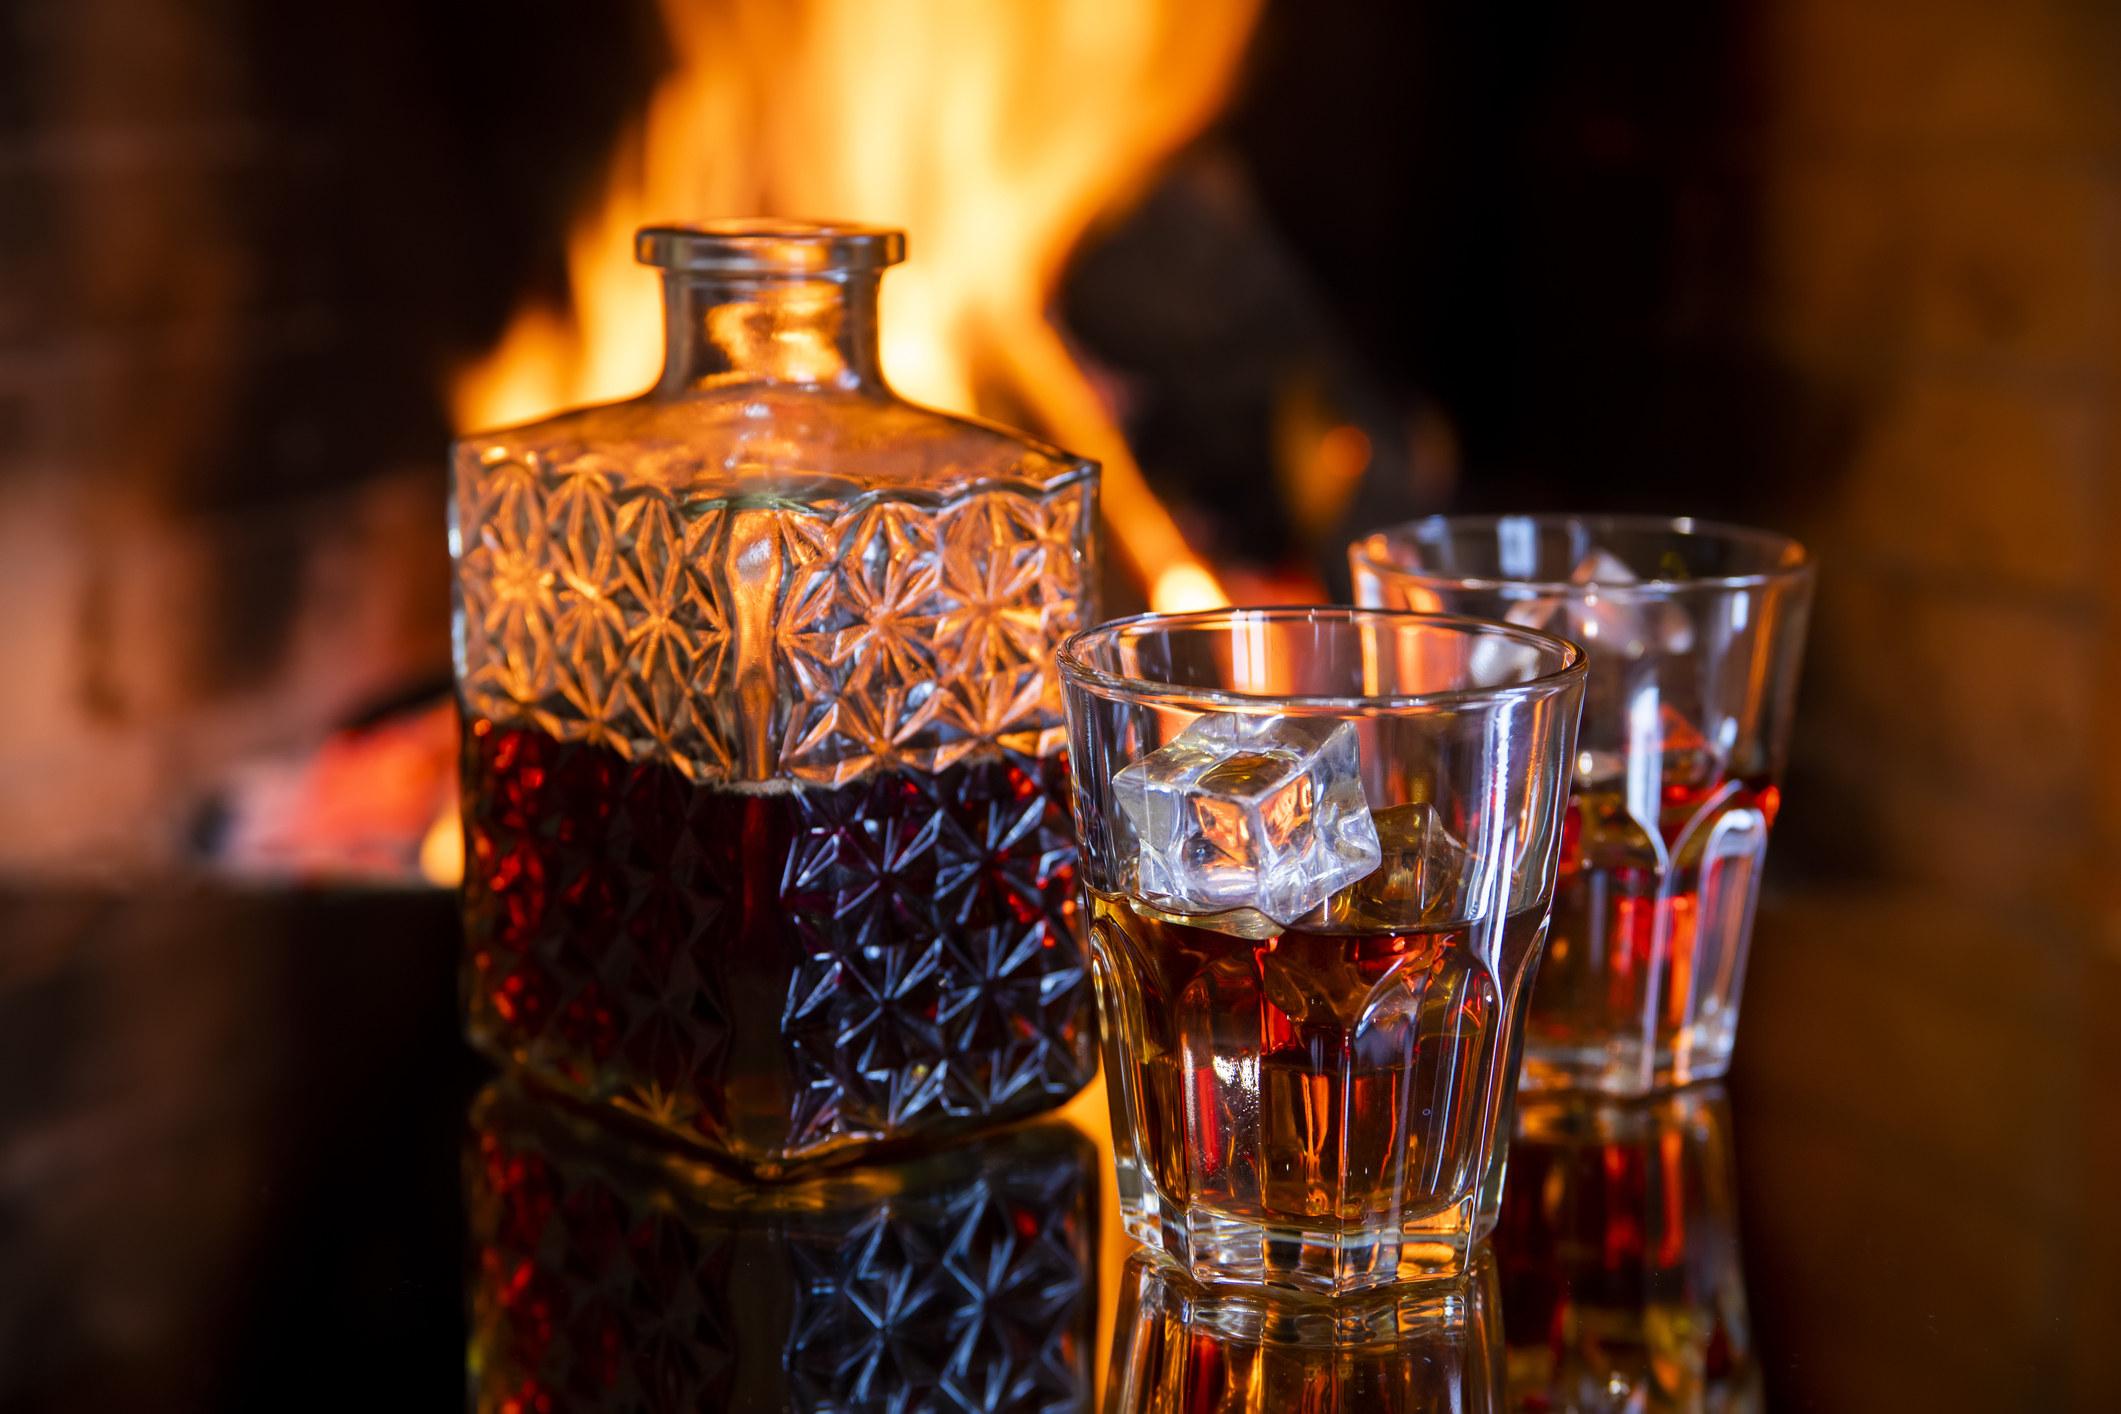 A crystal brandy decanter